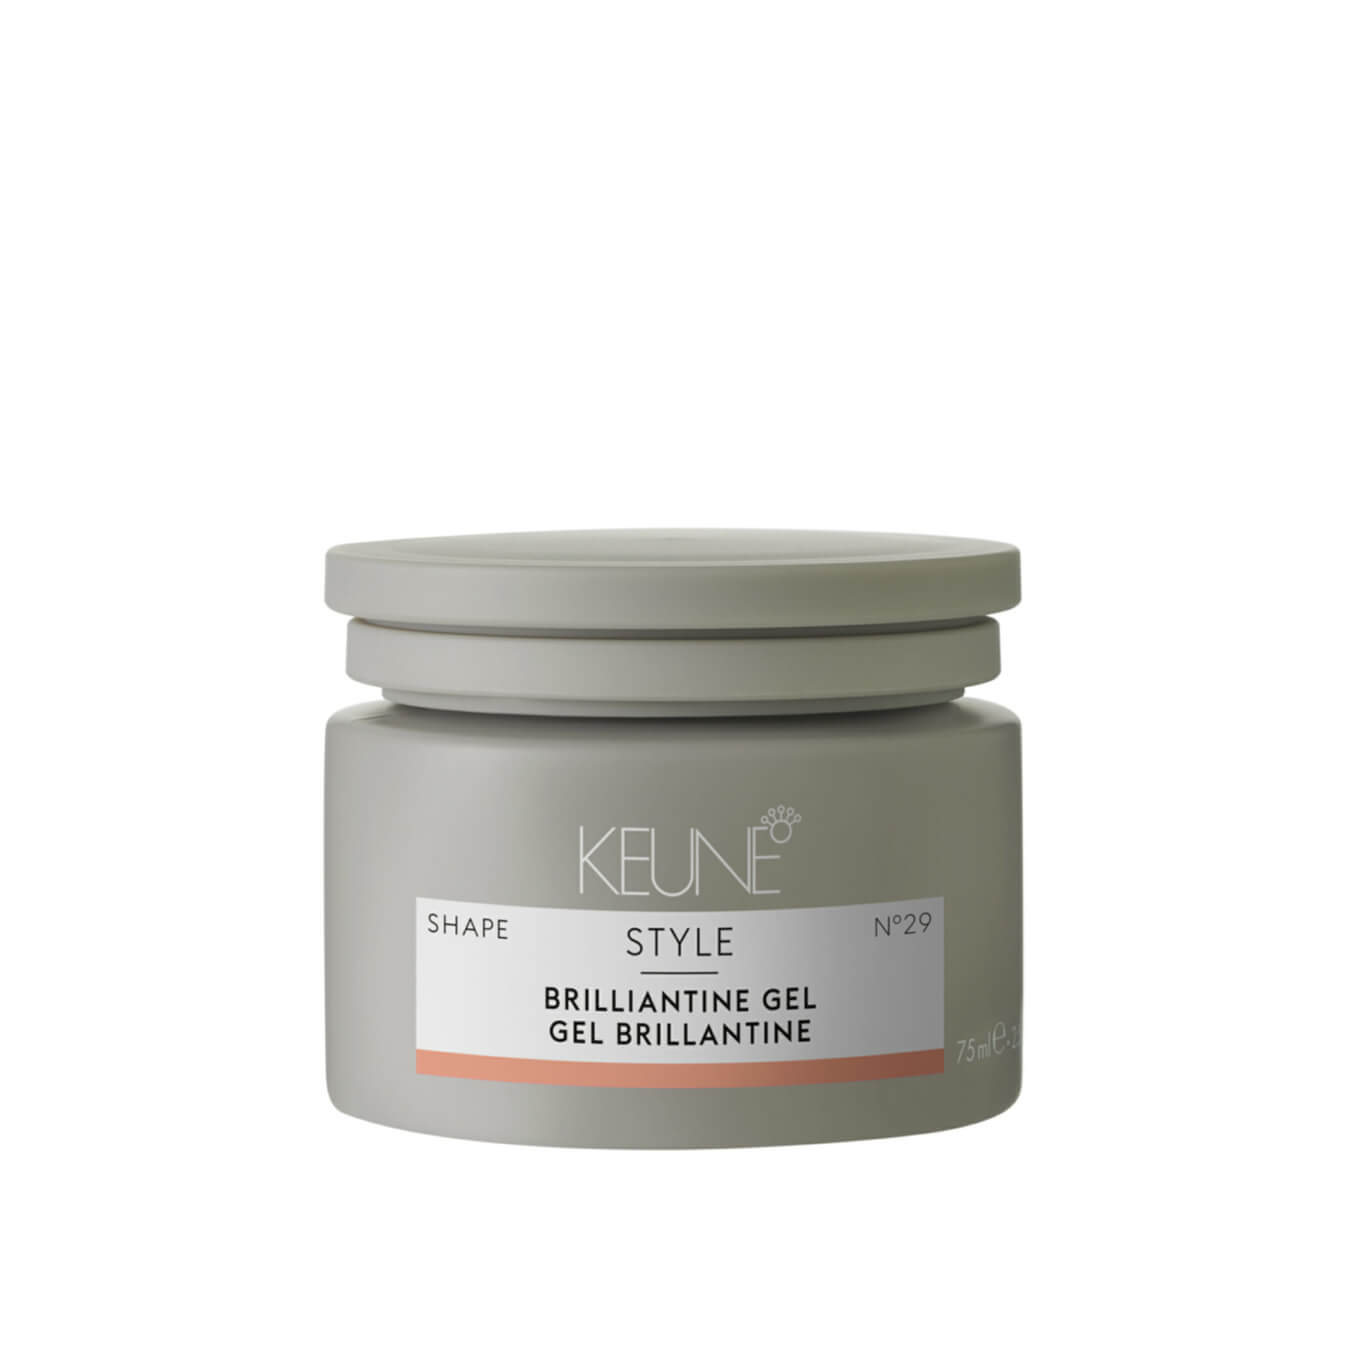 Kauf Keune Style Brilliantine gel 75ml